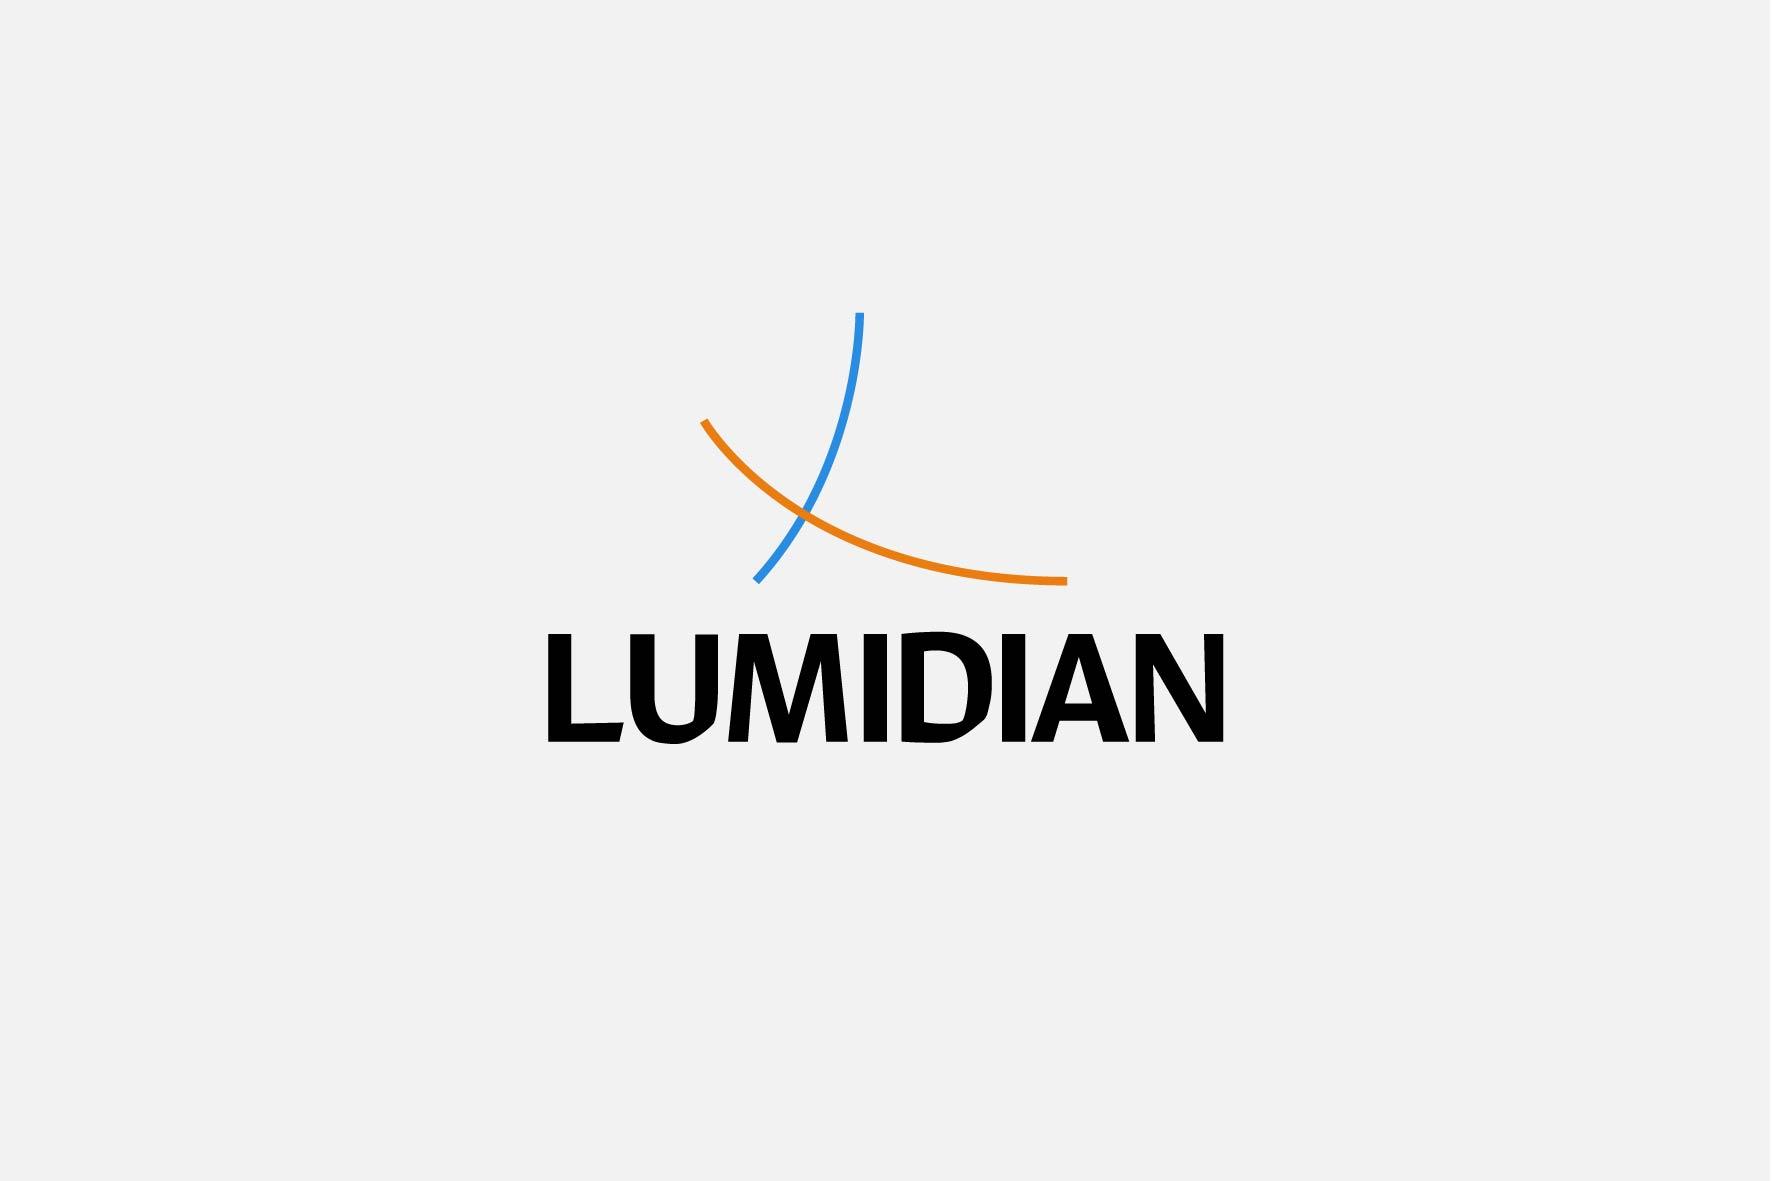 Lumidian-logo-Daniel-Cavalcanti-01-01